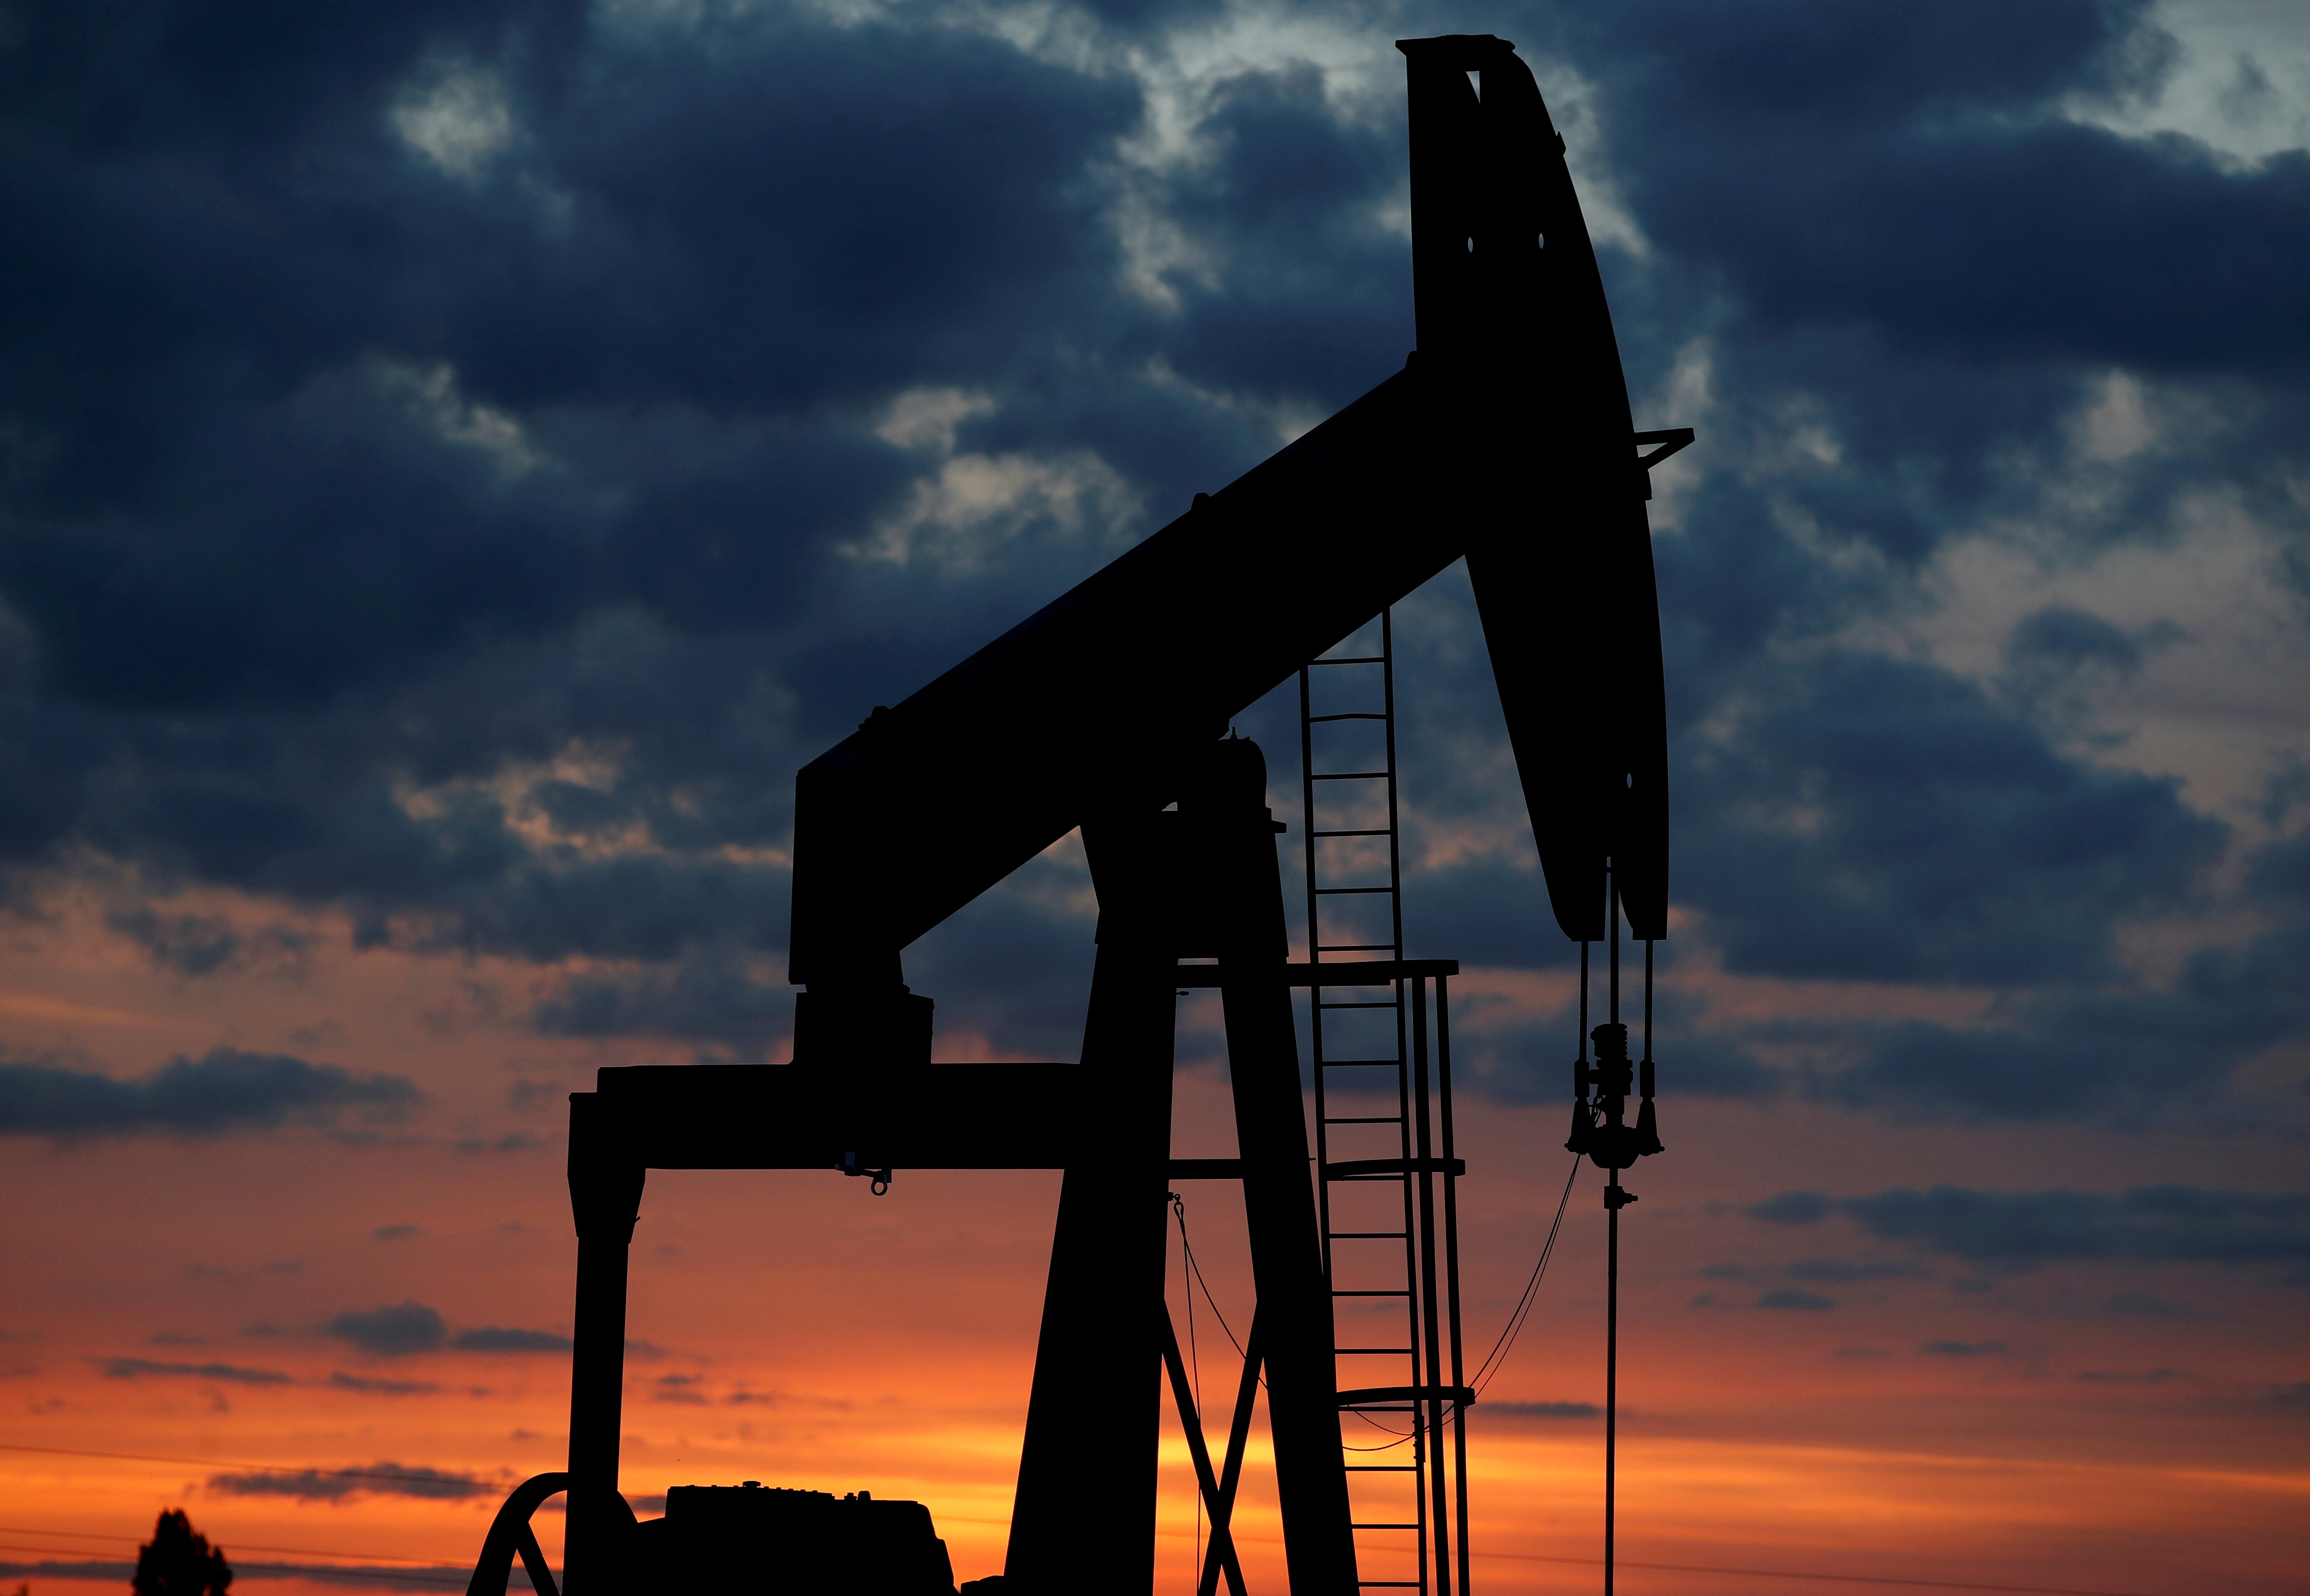 An oil pump is seen at sunset outside Vaudoy-en-Brie, near Paris, France April 23, 2018. REUTERS/Christian Hartmann